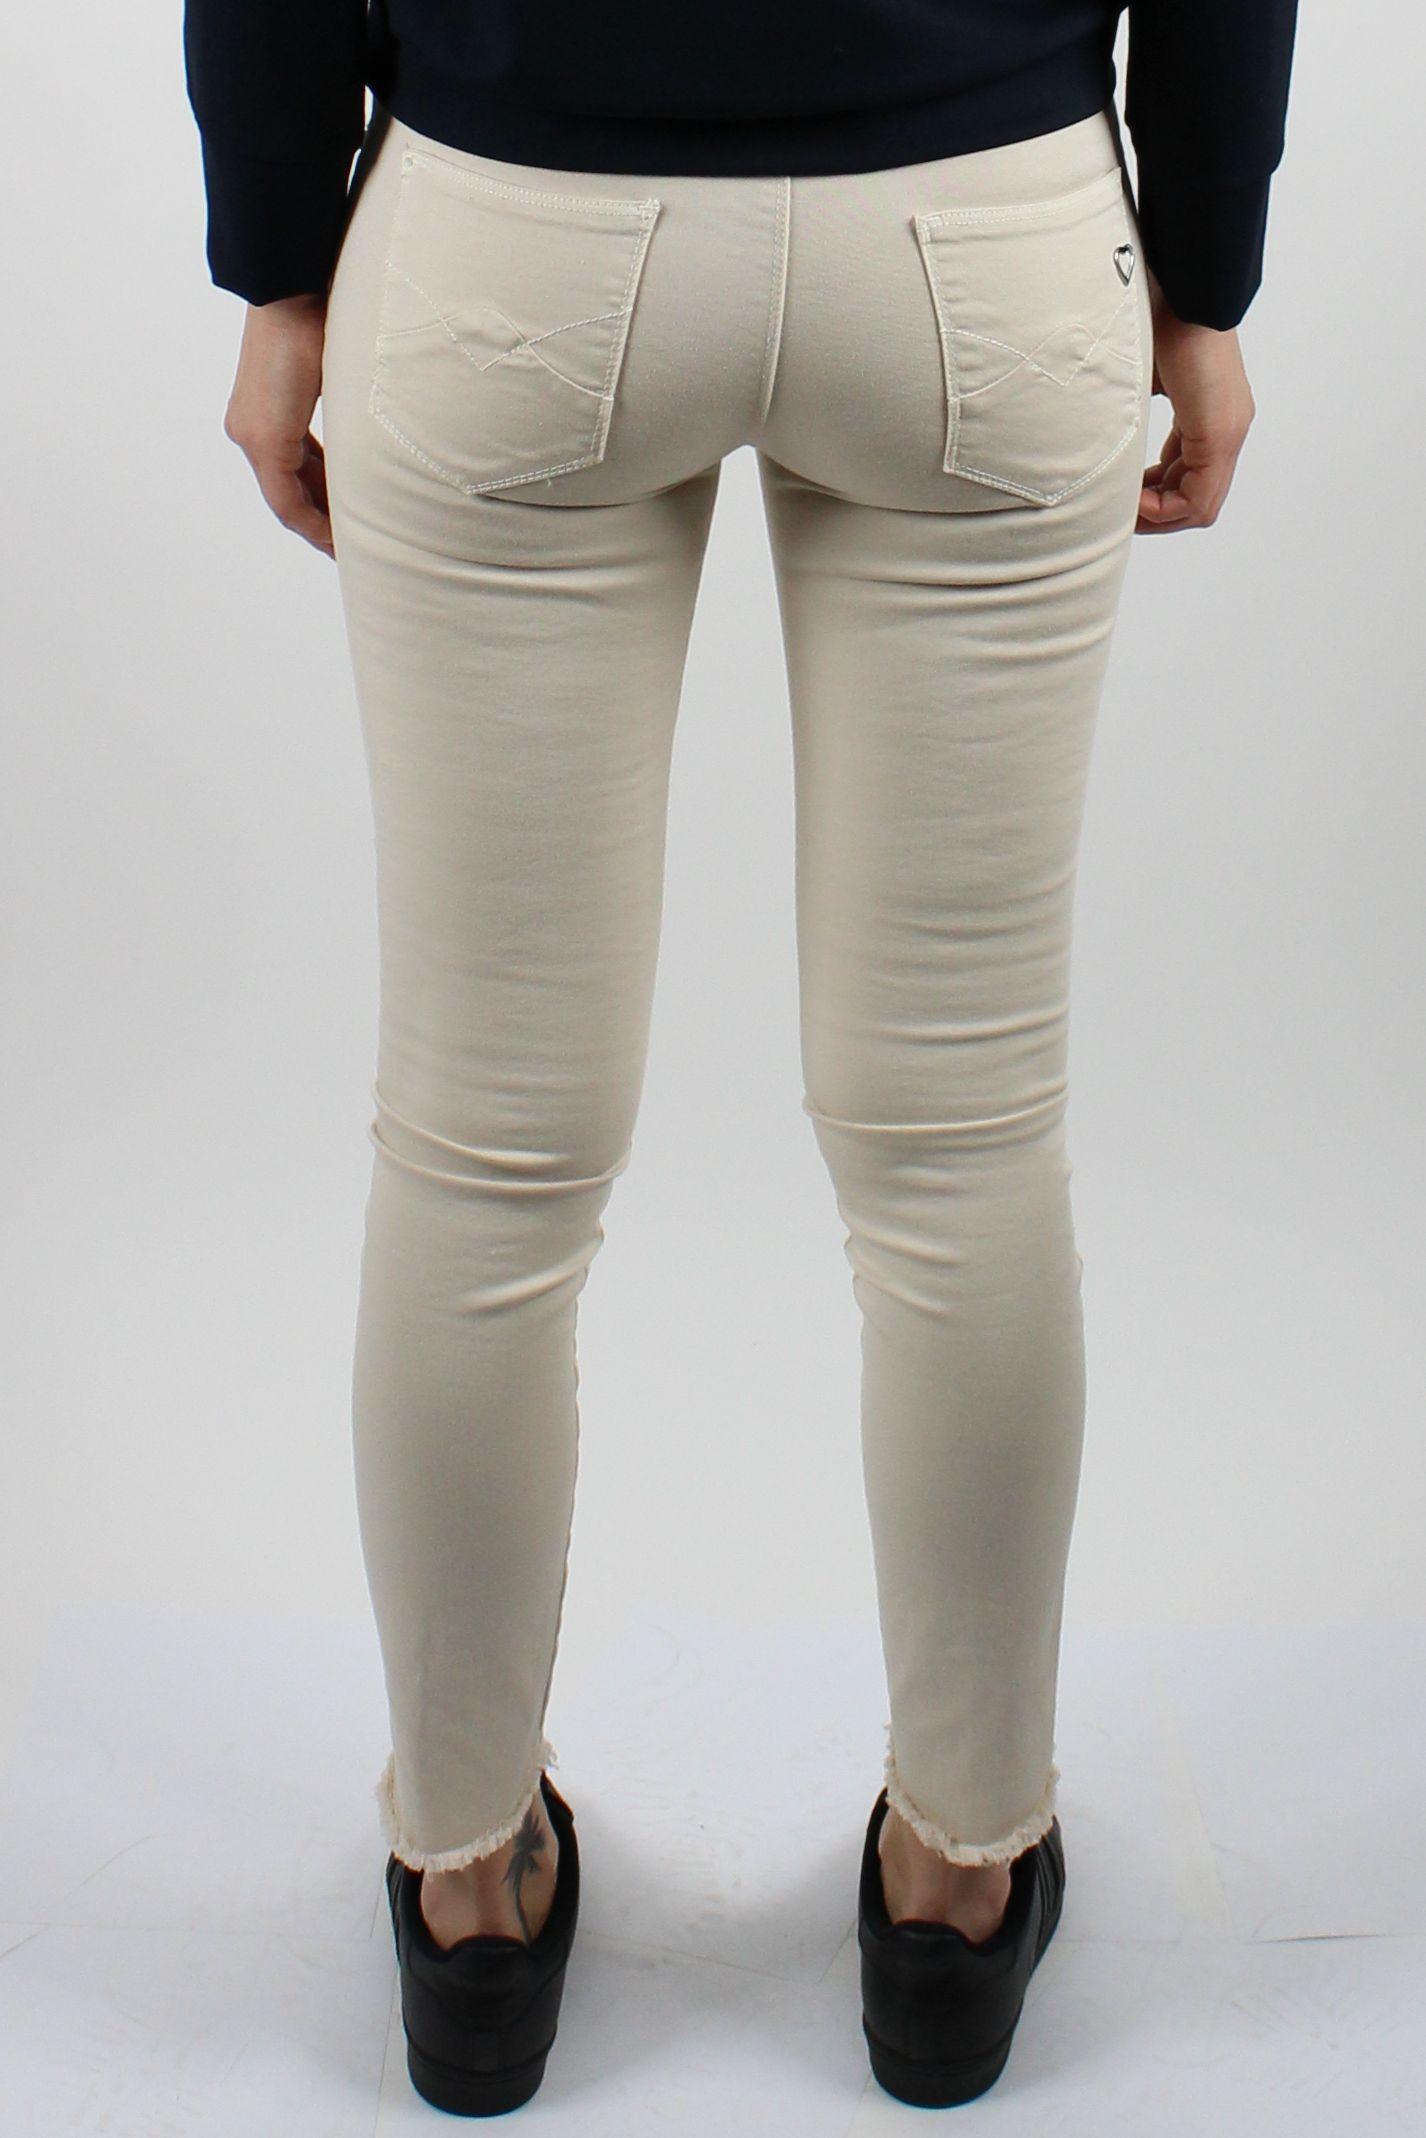 96fb781b795 Úzke dámske nohavice s roztrapkaným spodkom - Brands Made in Italy